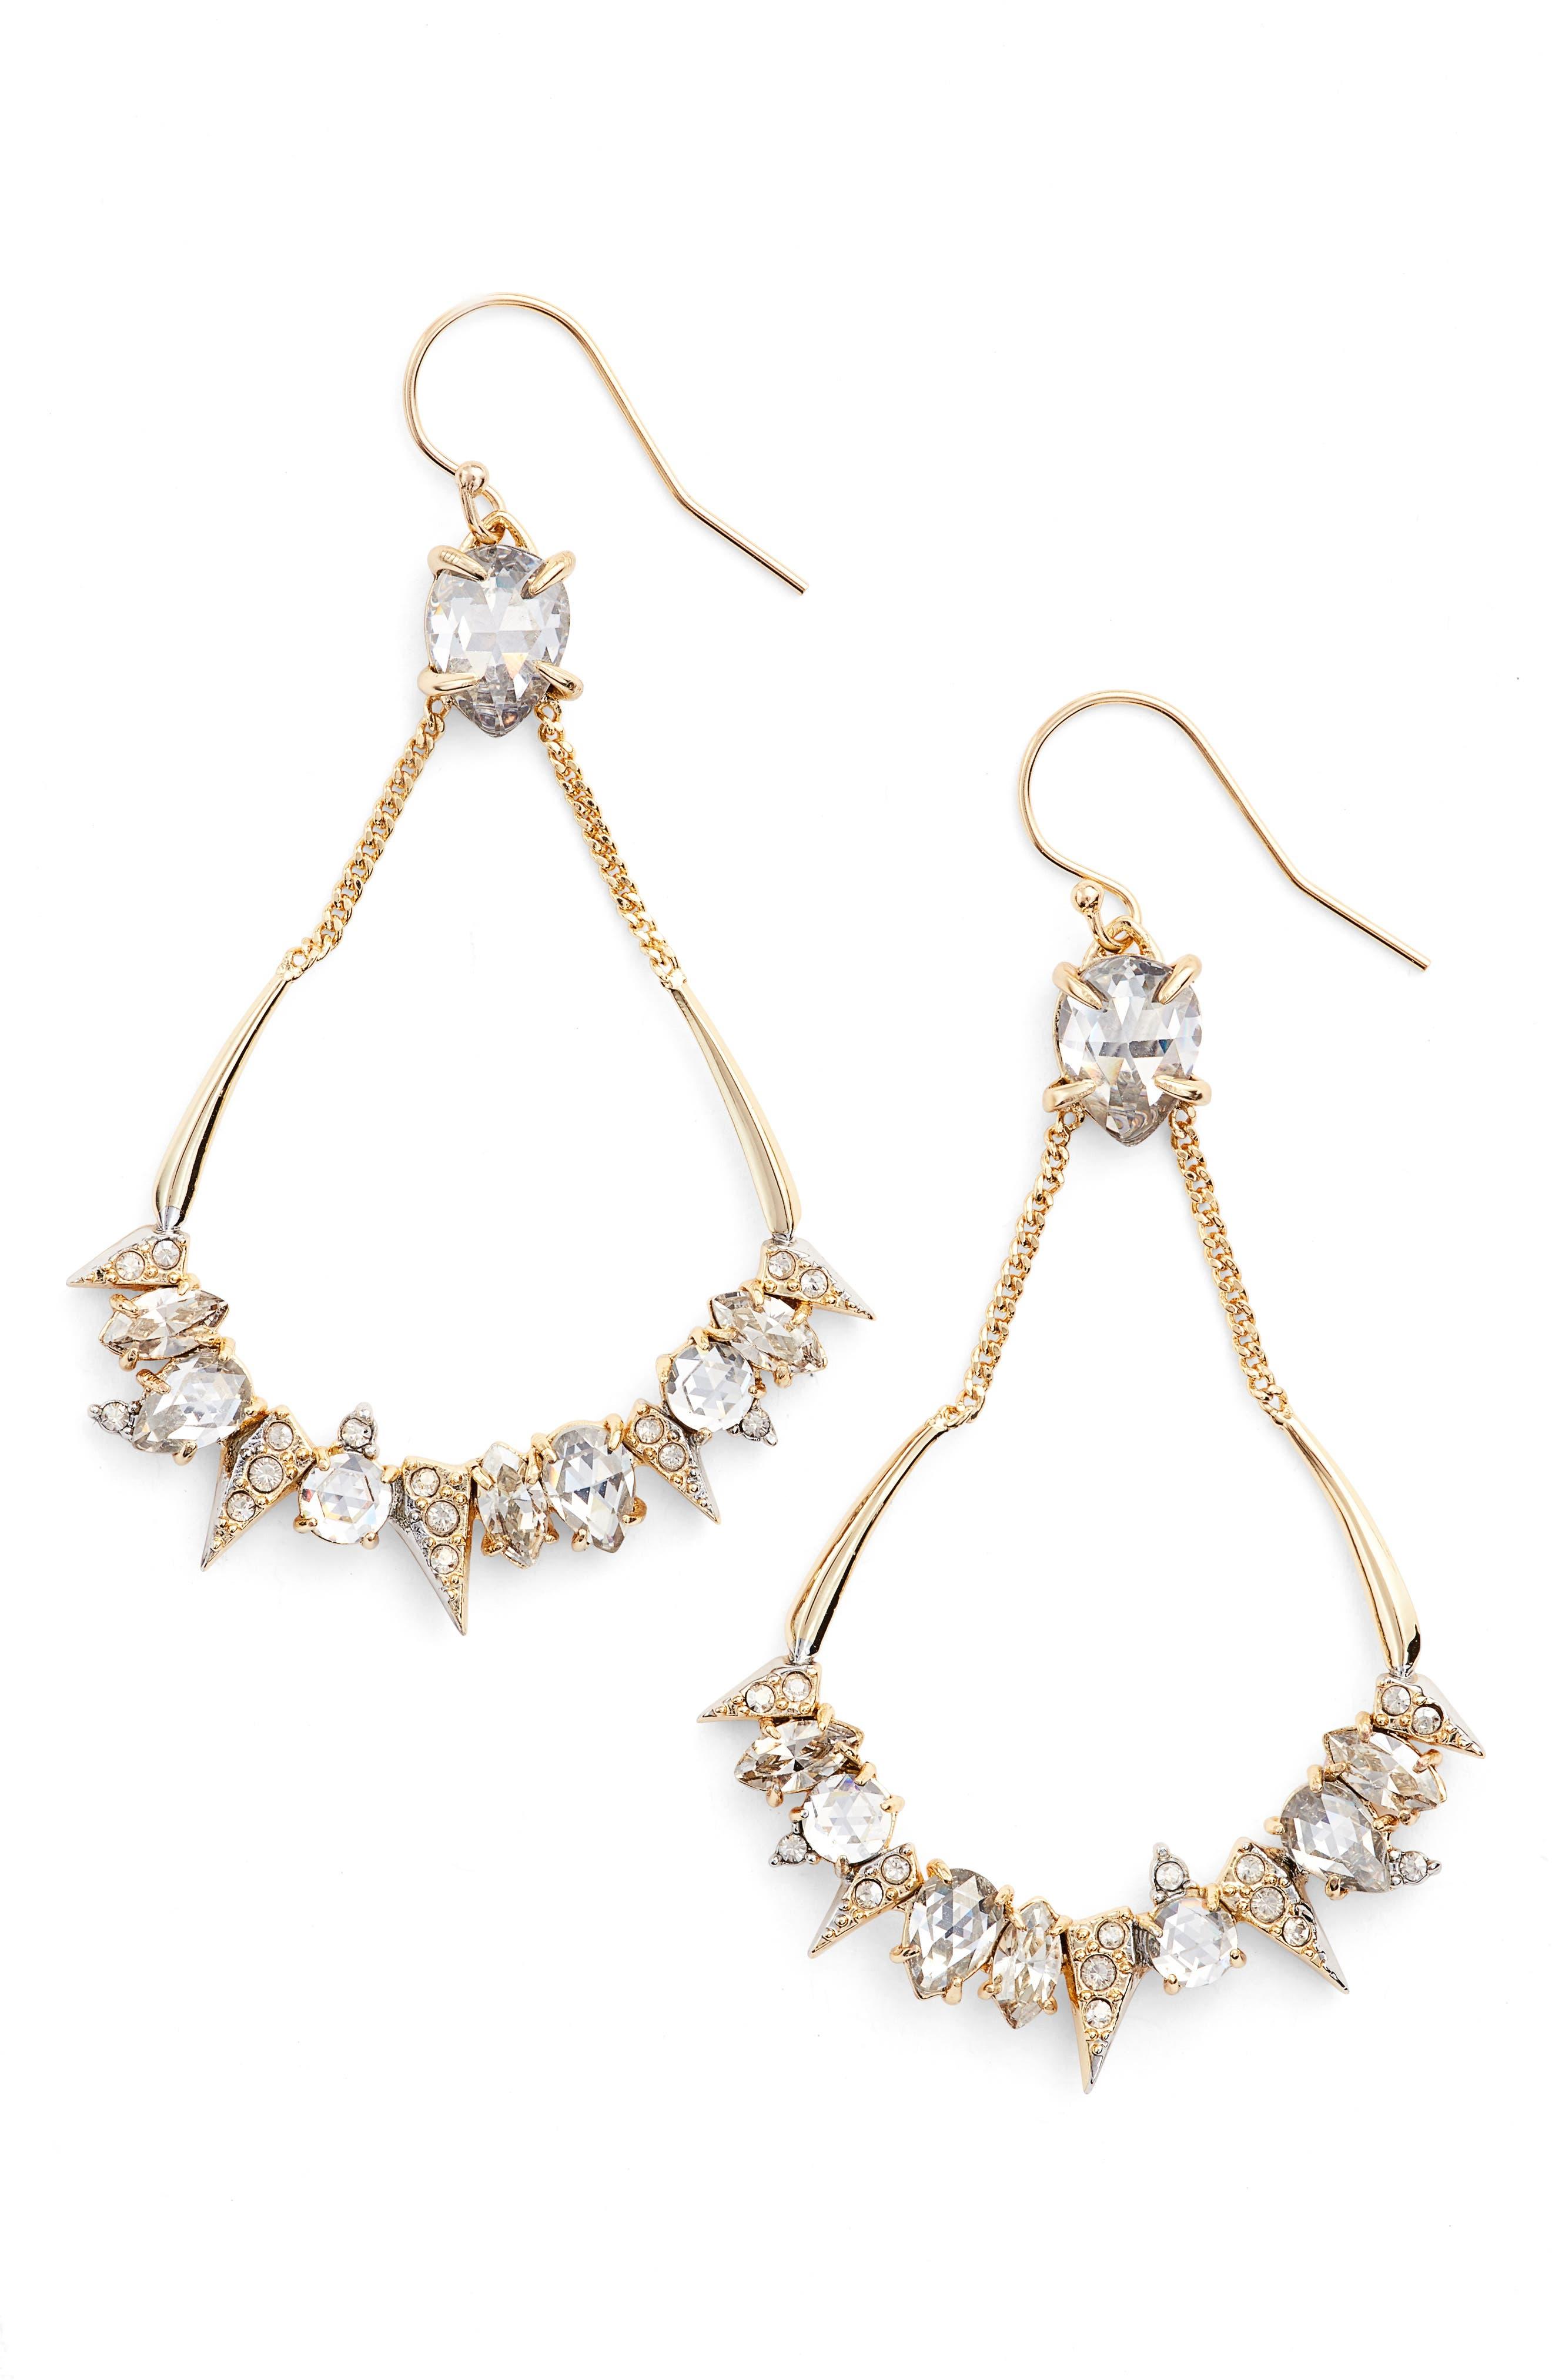 Crystal Encrusted Mosaic Drop Earrings,                             Main thumbnail 1, color,                             710